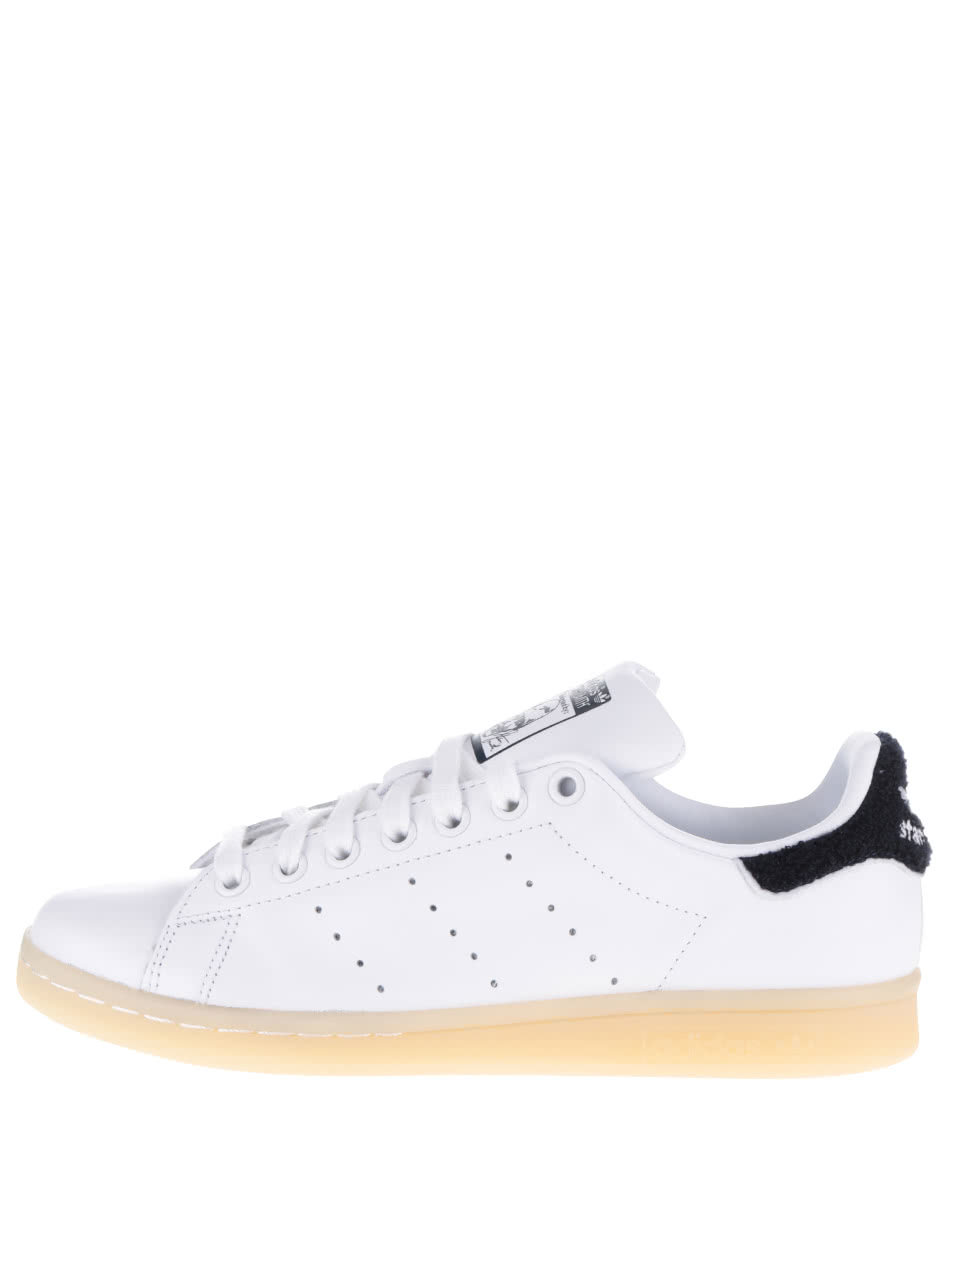 1acbd3ccff93f Čierno-biele dámske tenisky adidas Originals Stan Smith | ZOOT.sk